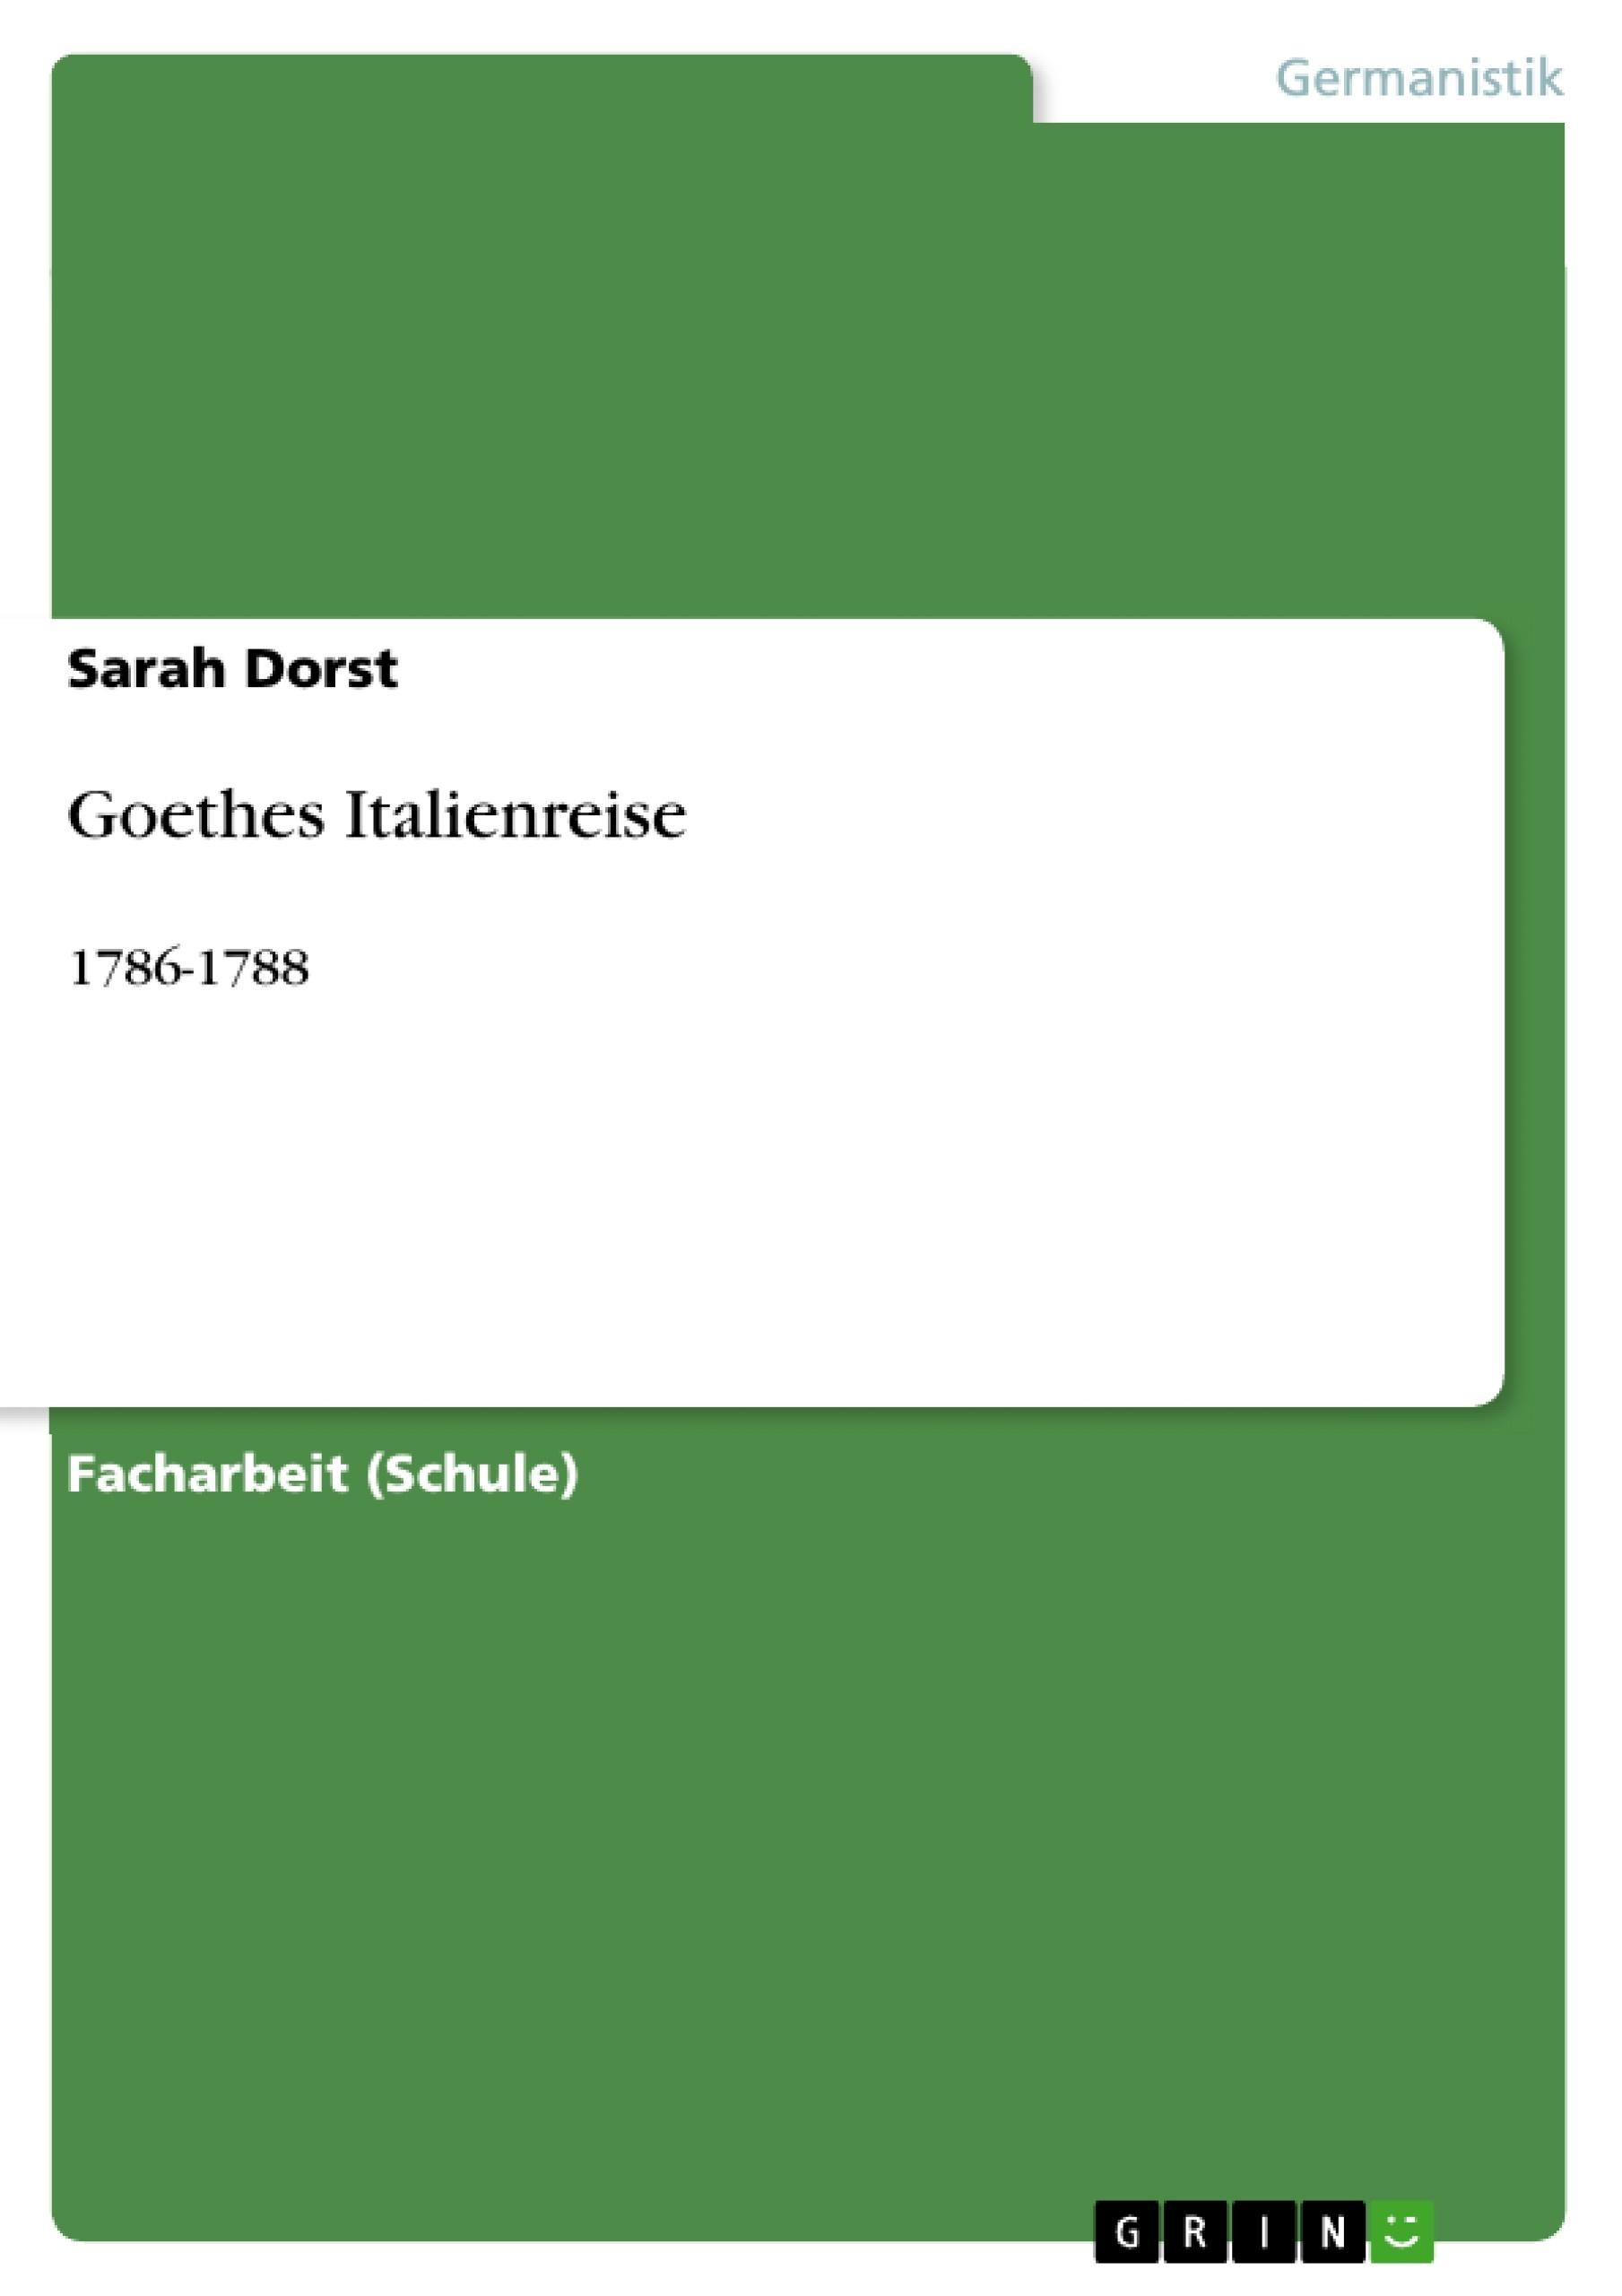 Titel: Goethes Italienreise